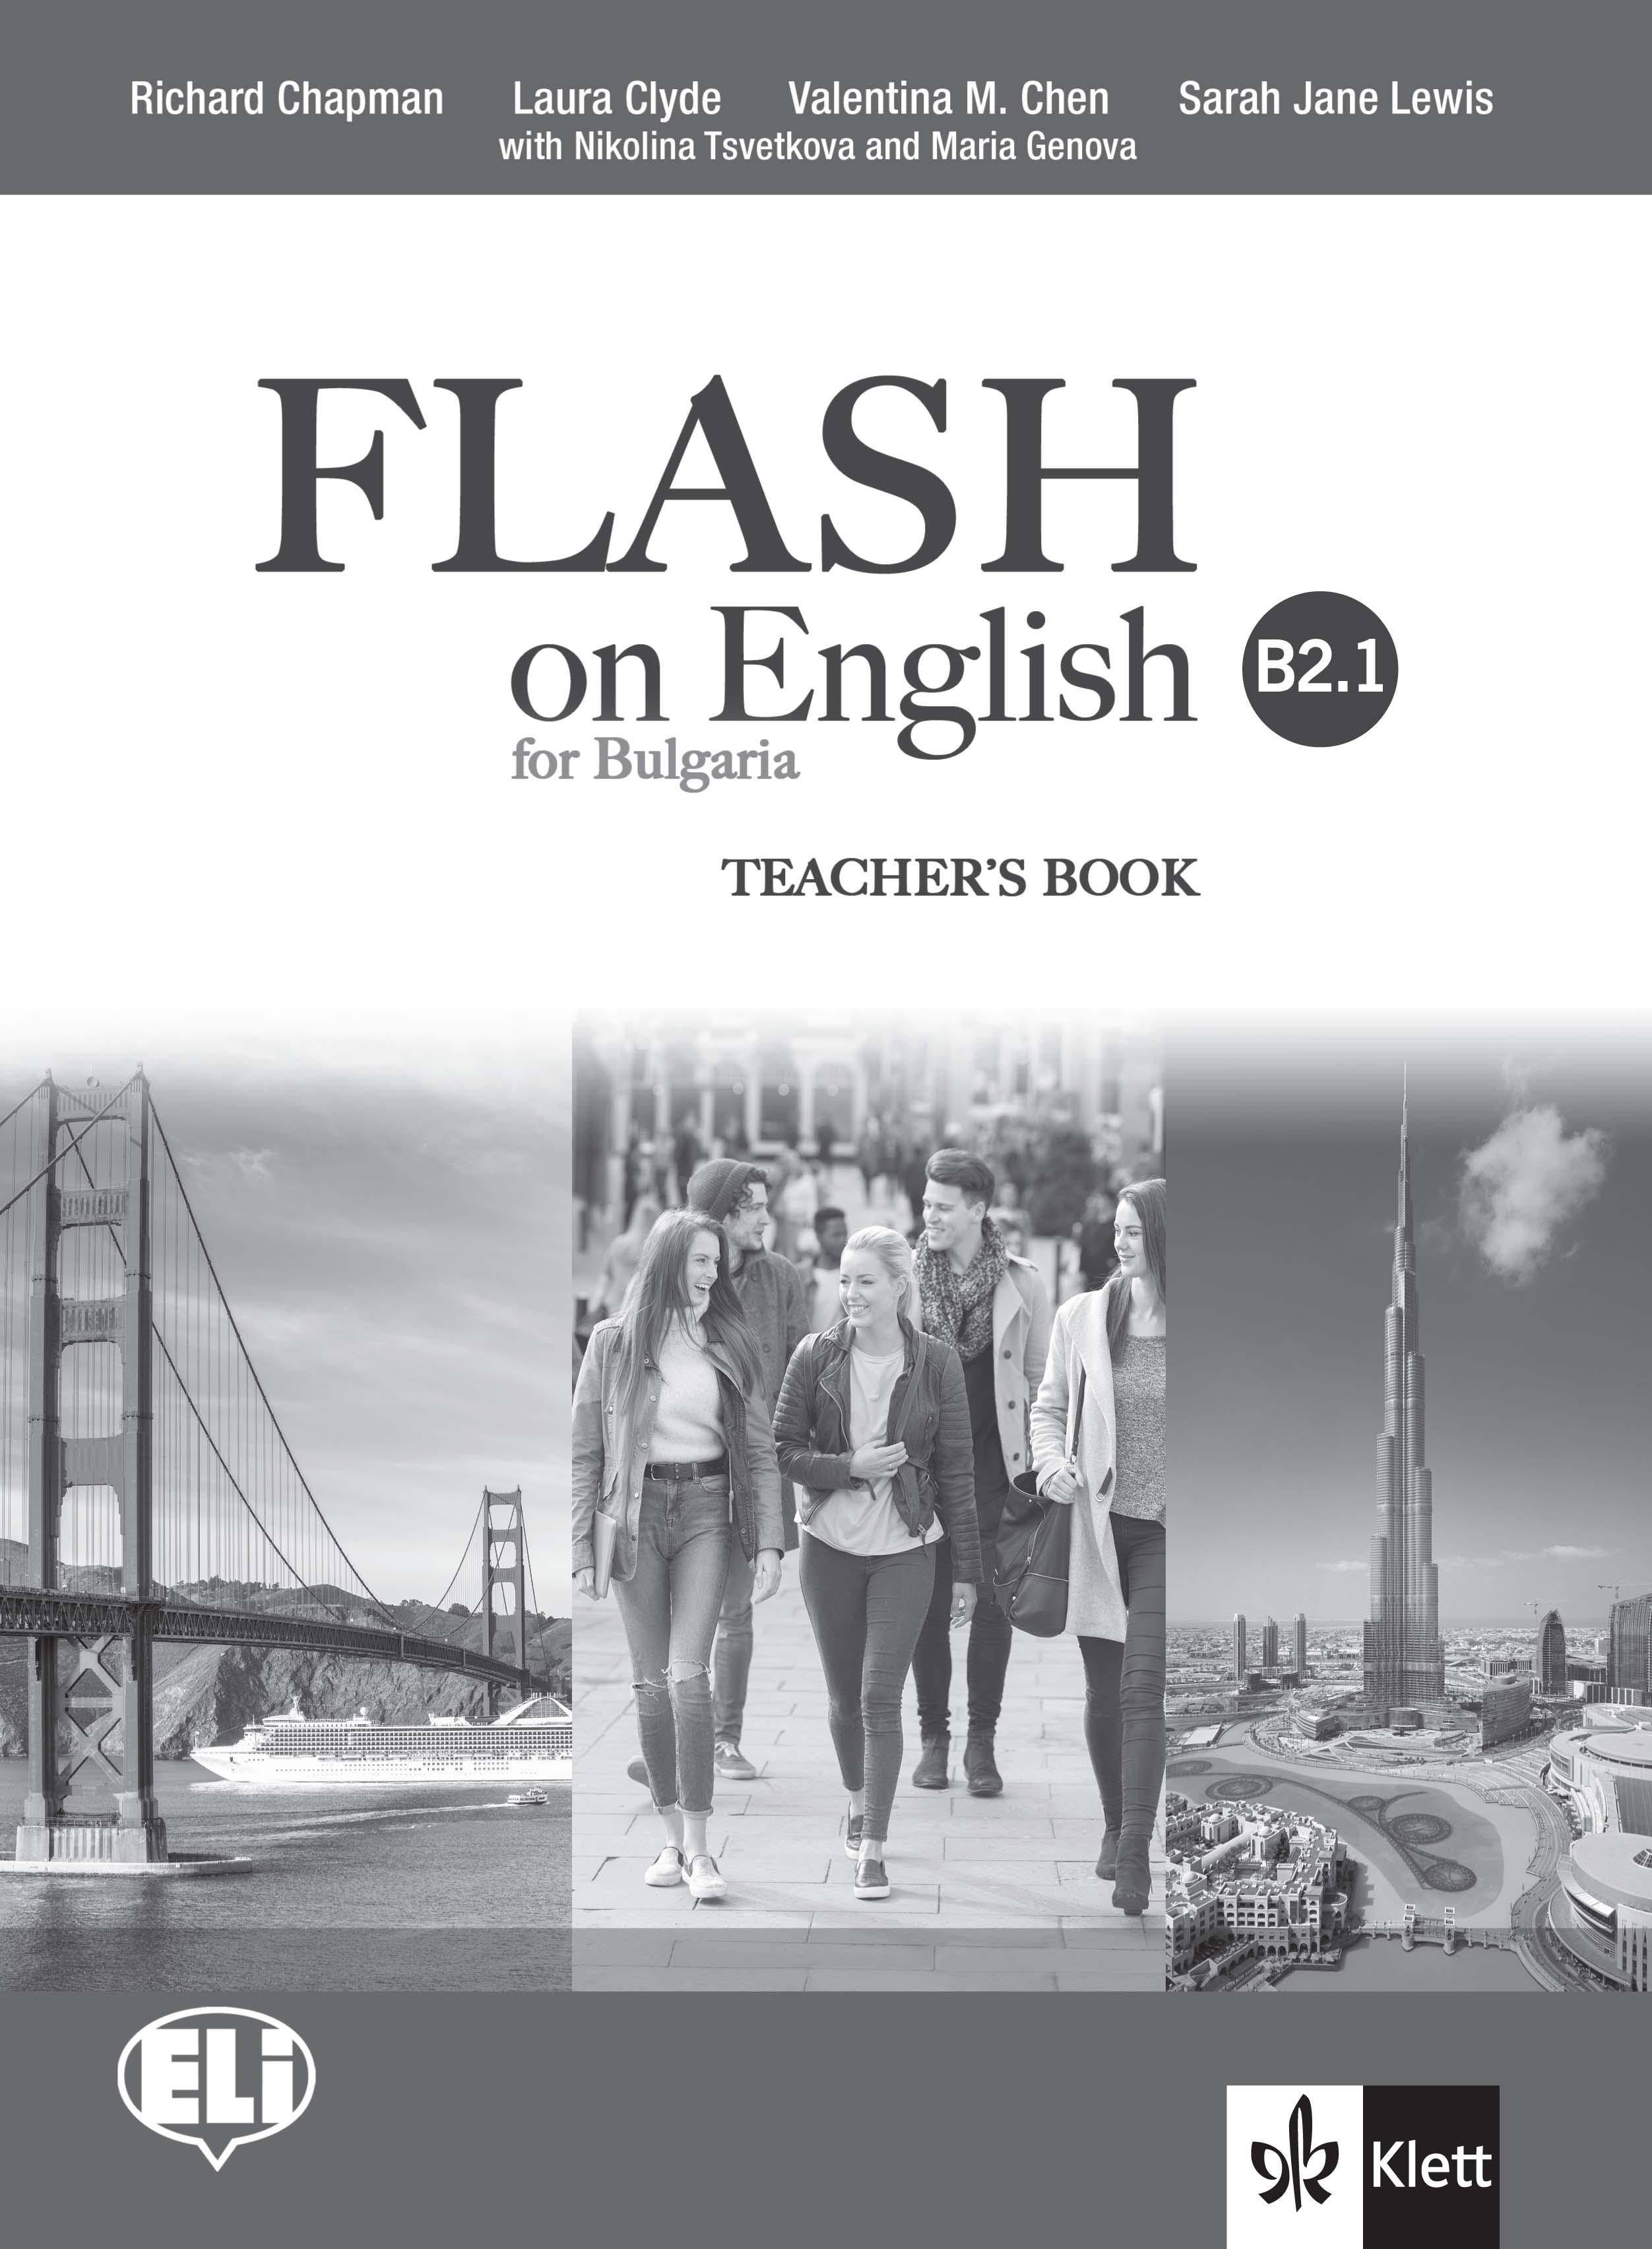 Flash on English for Bulgaria B2.1 Teachers Book